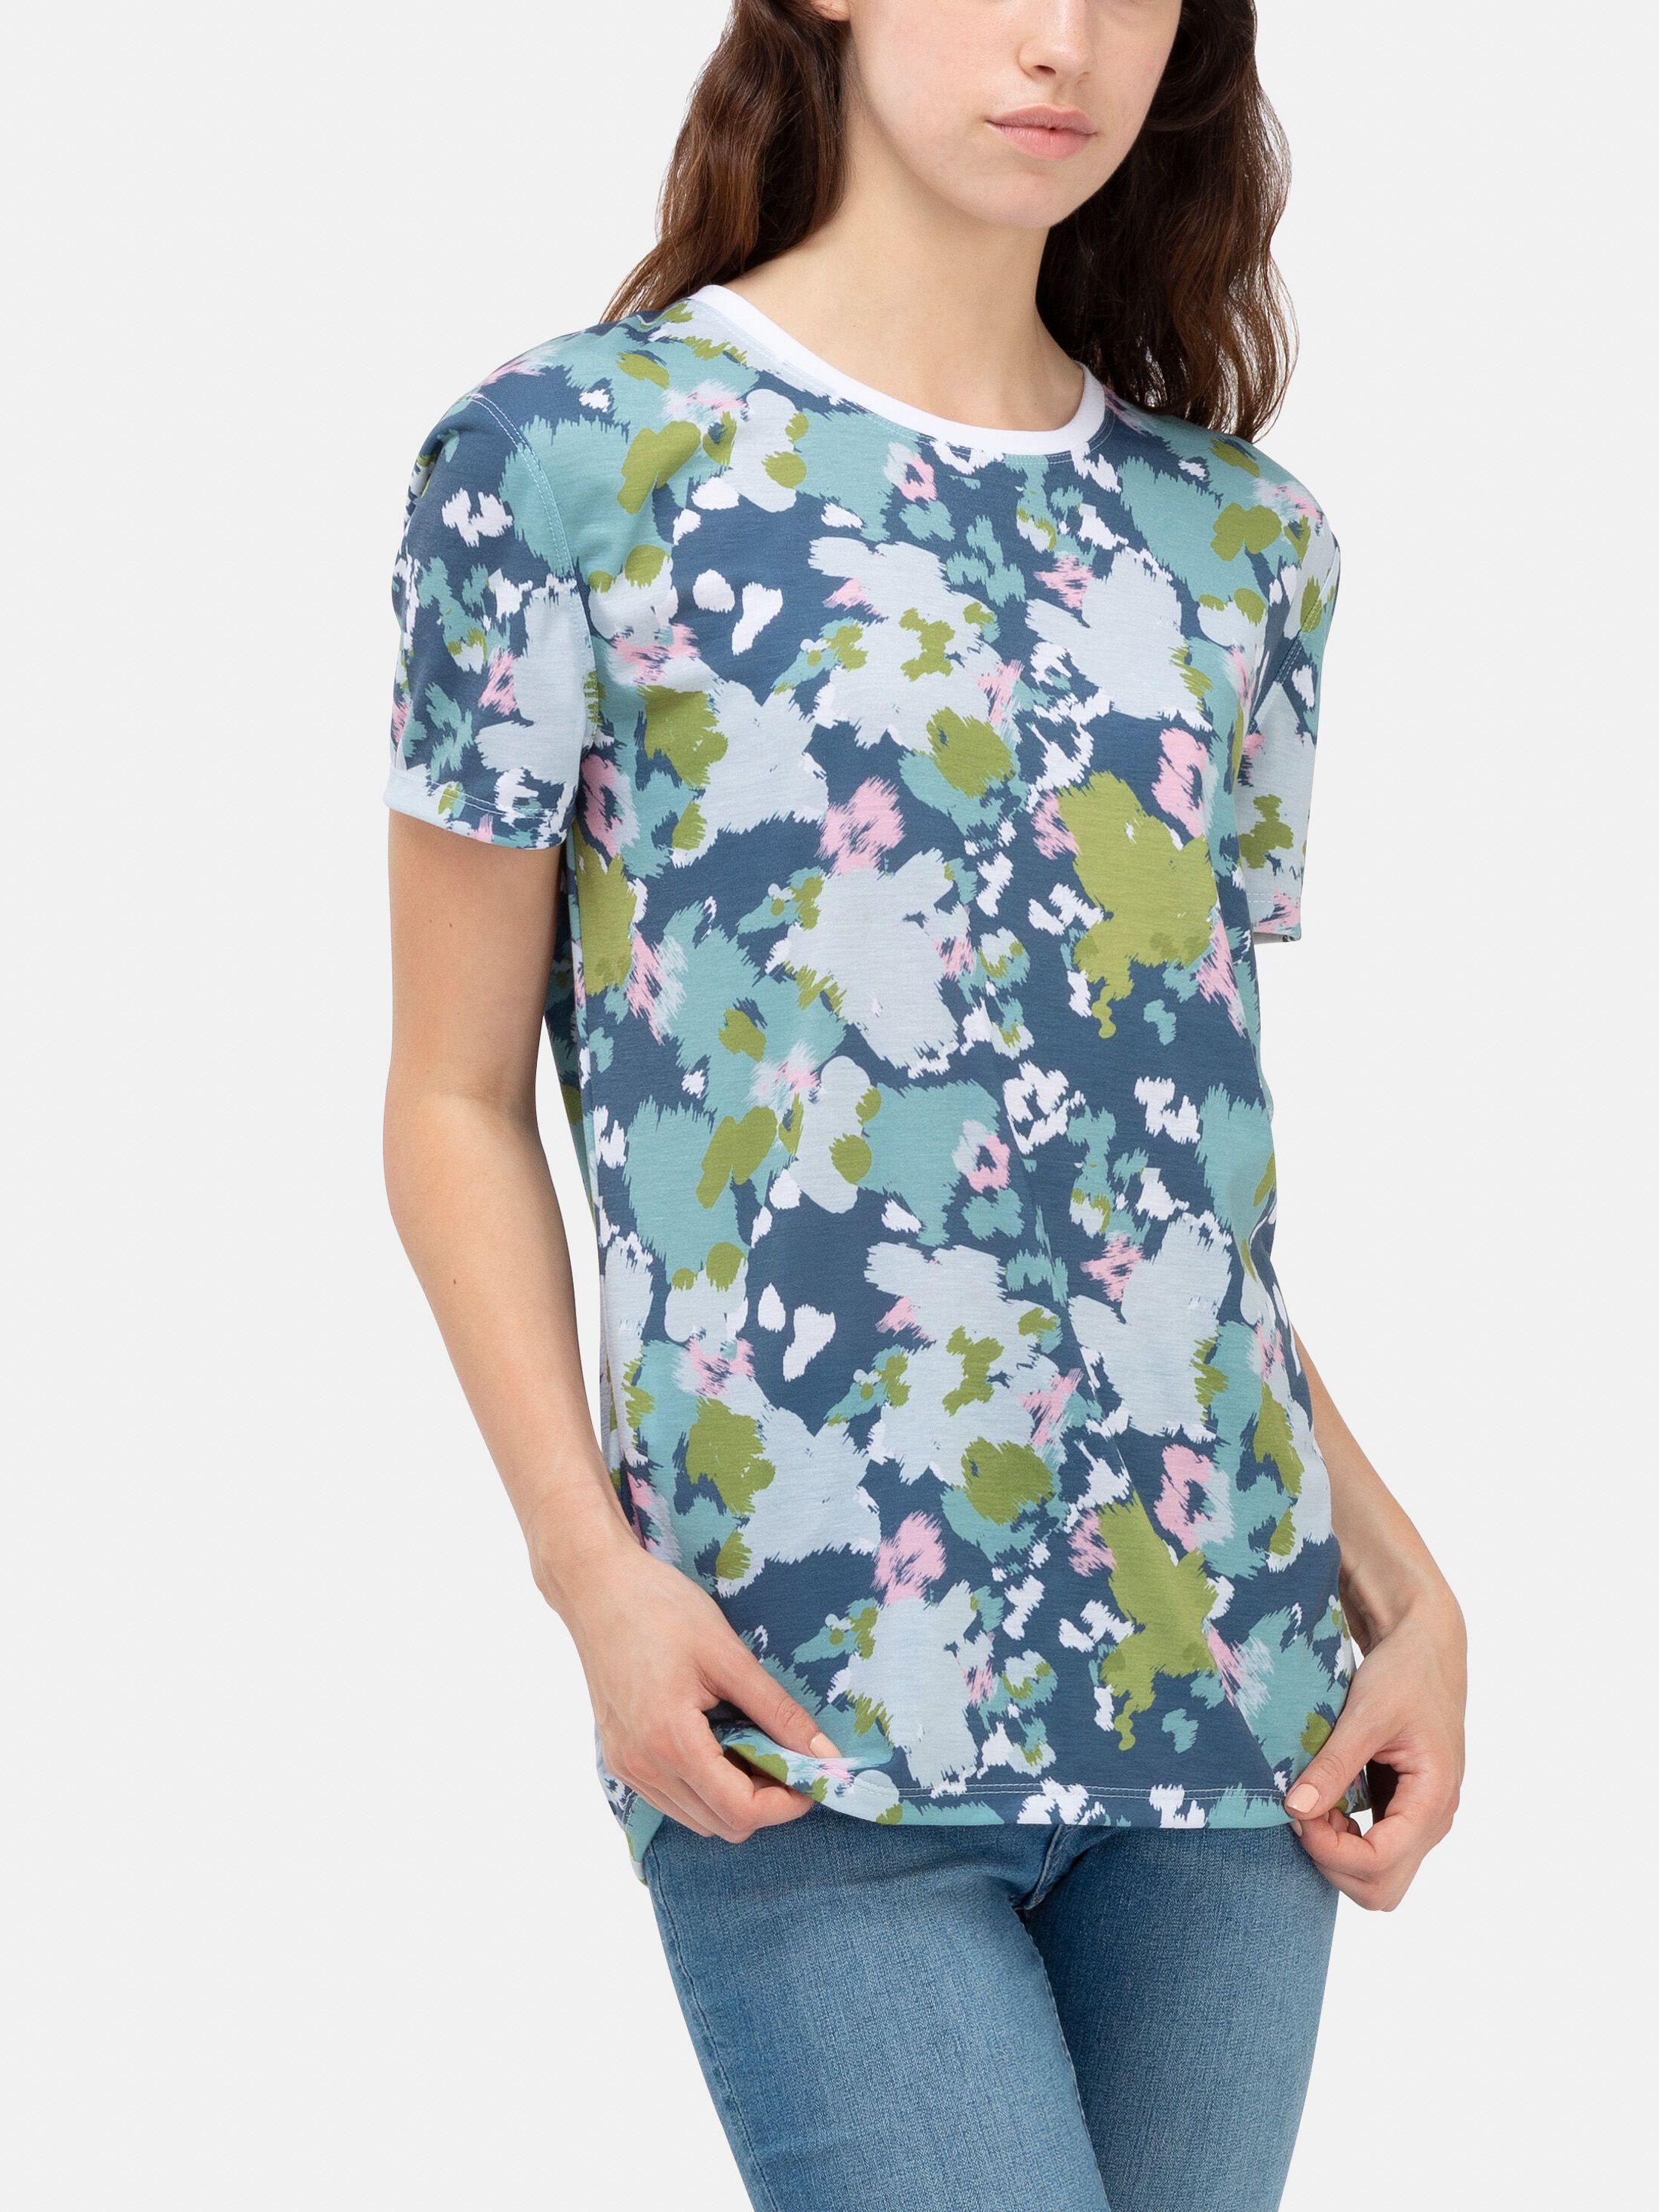 T-shirts faits à la demande